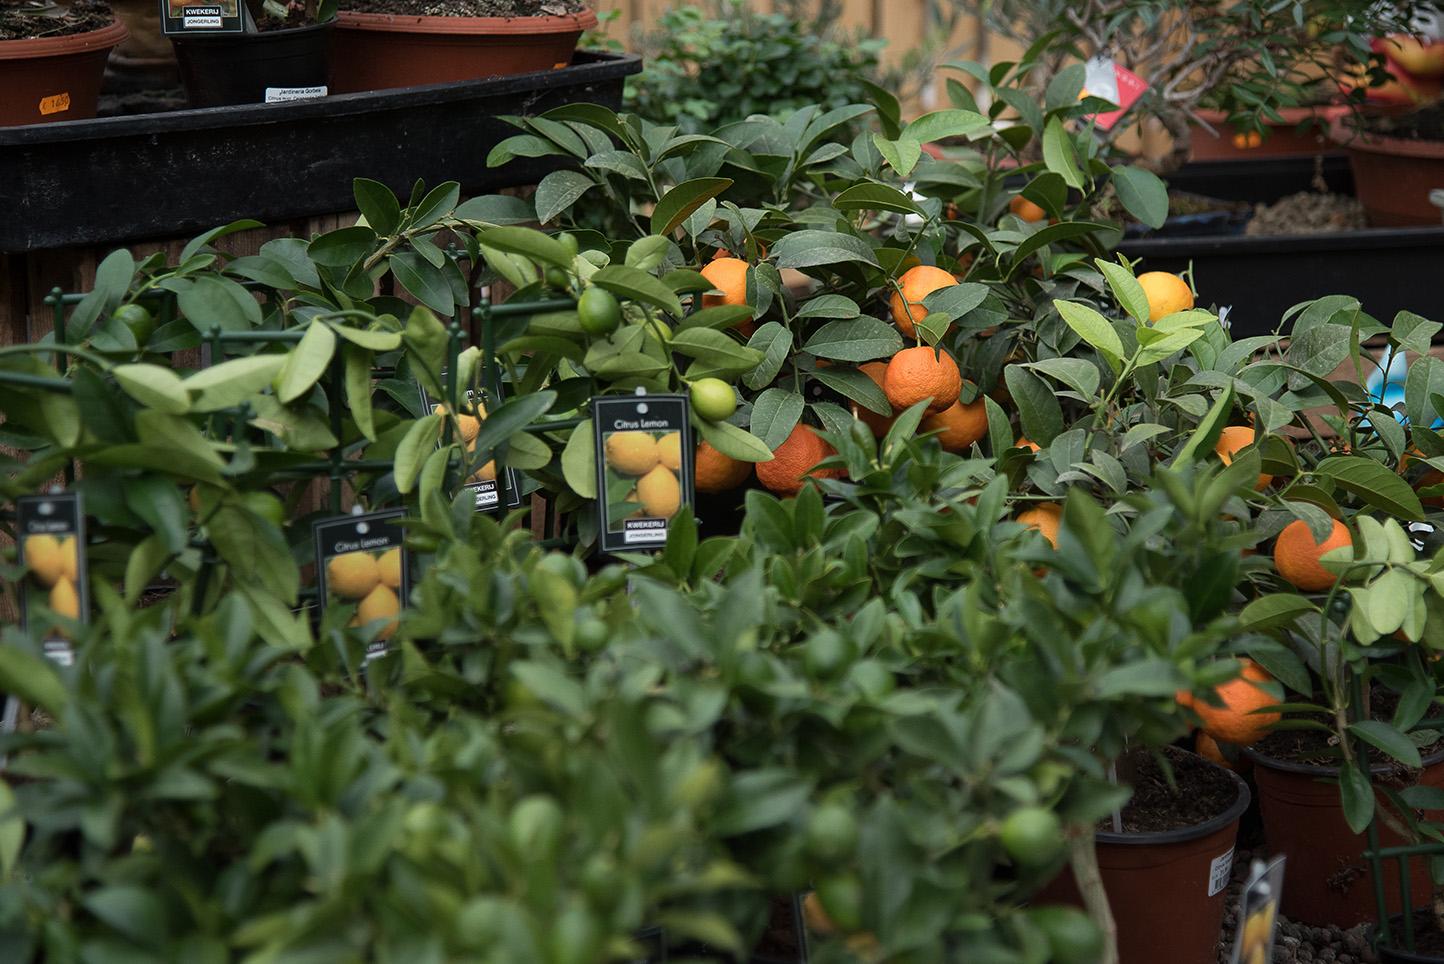 Centro de jardinería Gorbeia - Naranjos